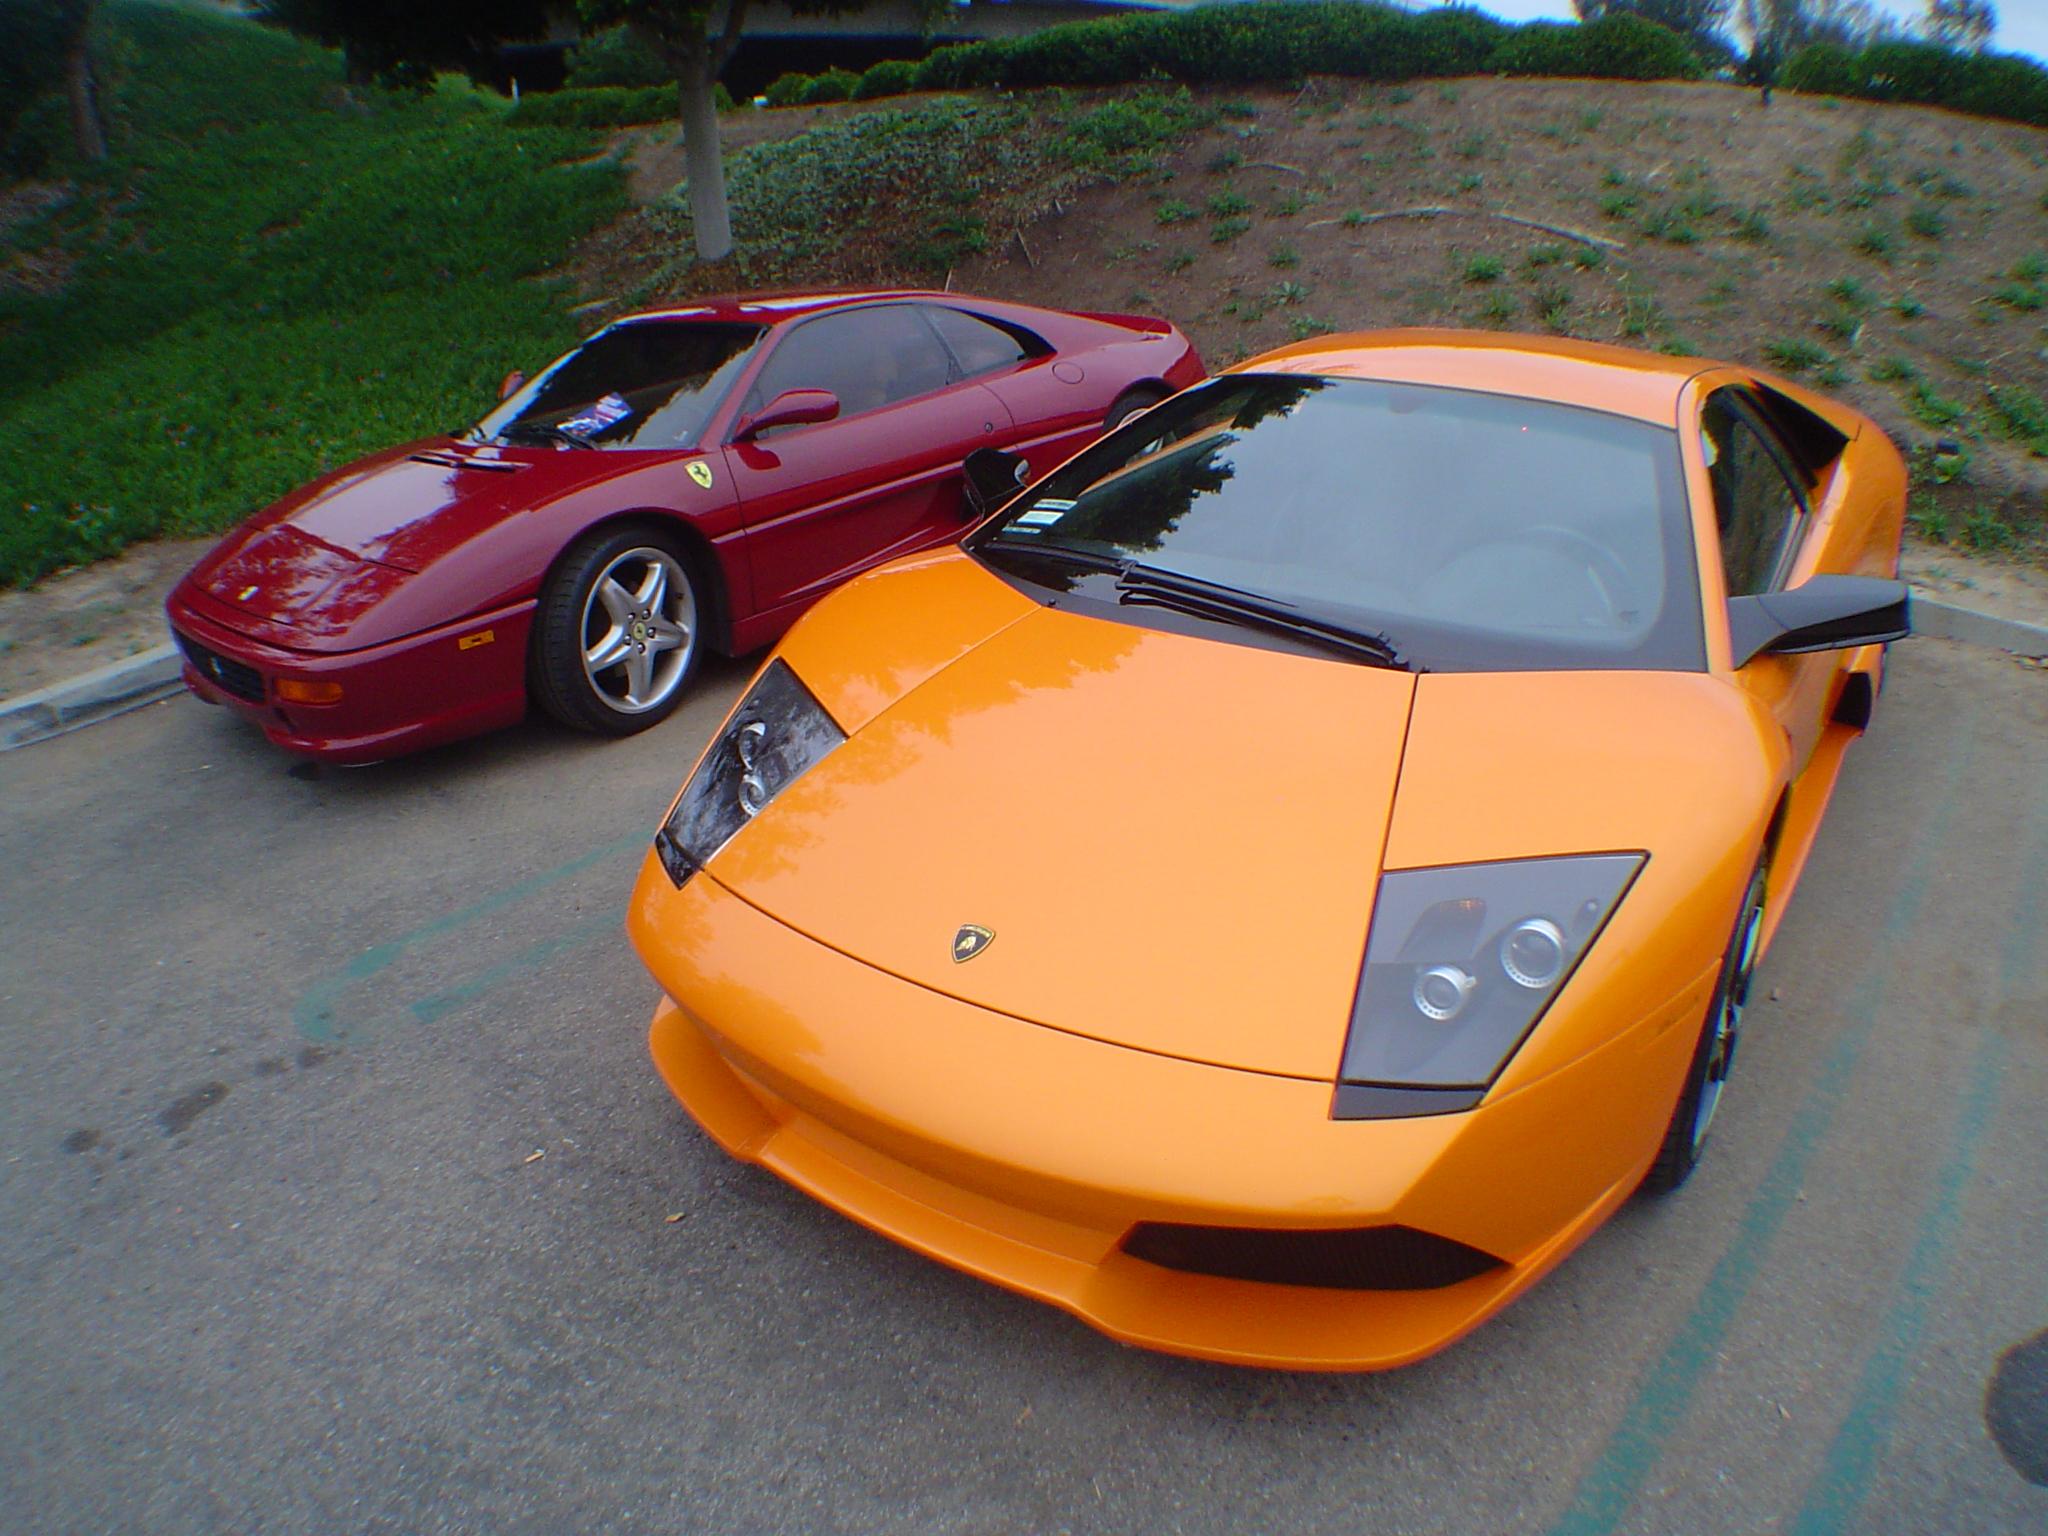 File Ferrari 355 And Lamborghini Lp640 Murcielago 3372972775 Jpg Wikimedia Commons